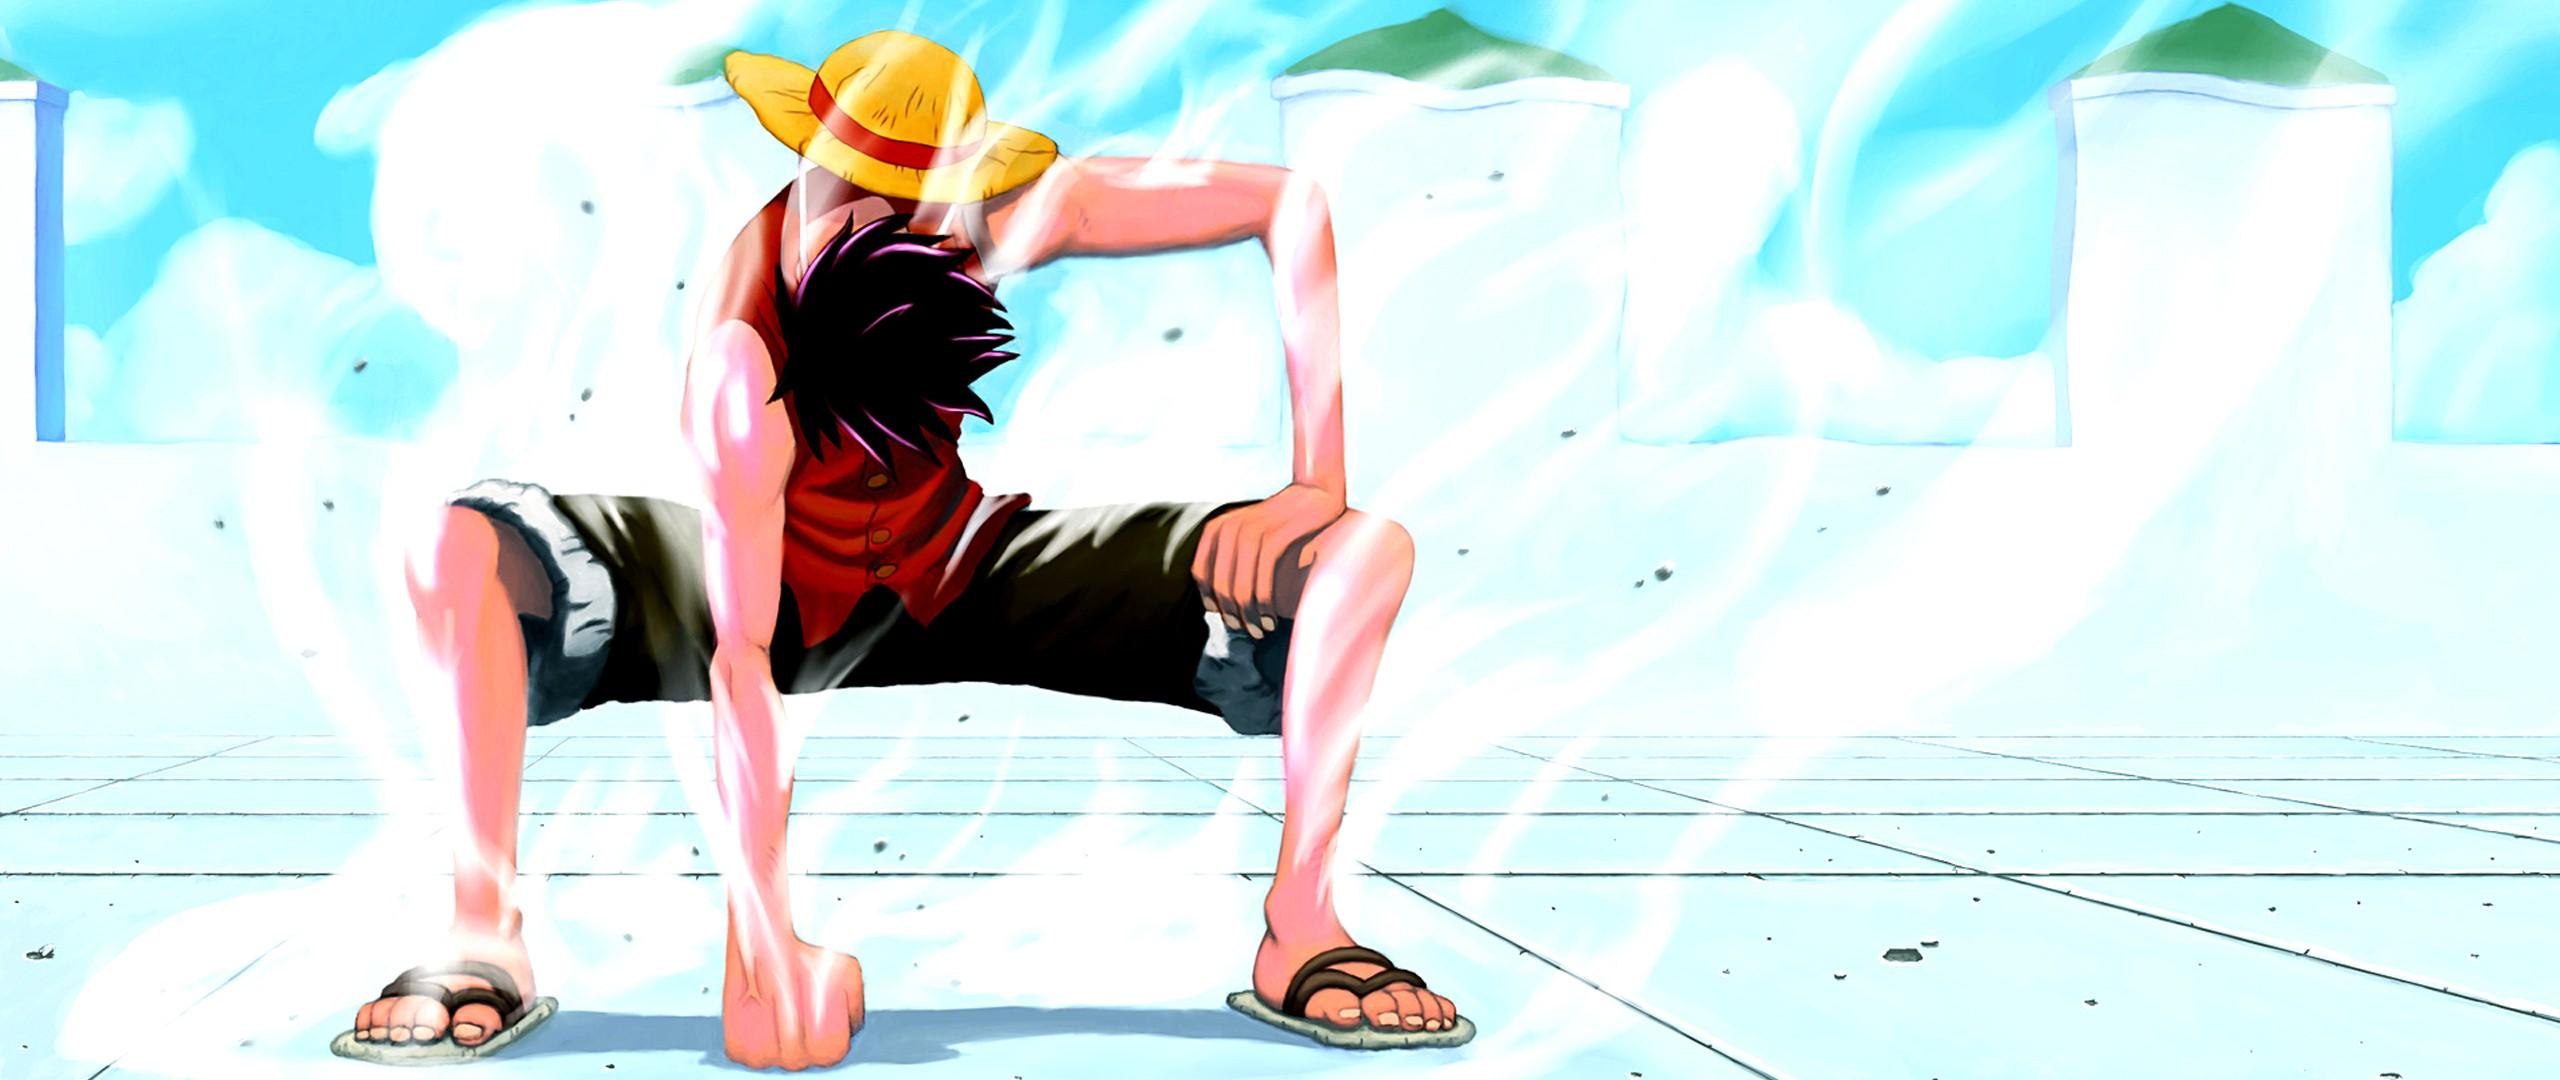 Wallpaper Illustration Anime Cartoon One Piece Monkey